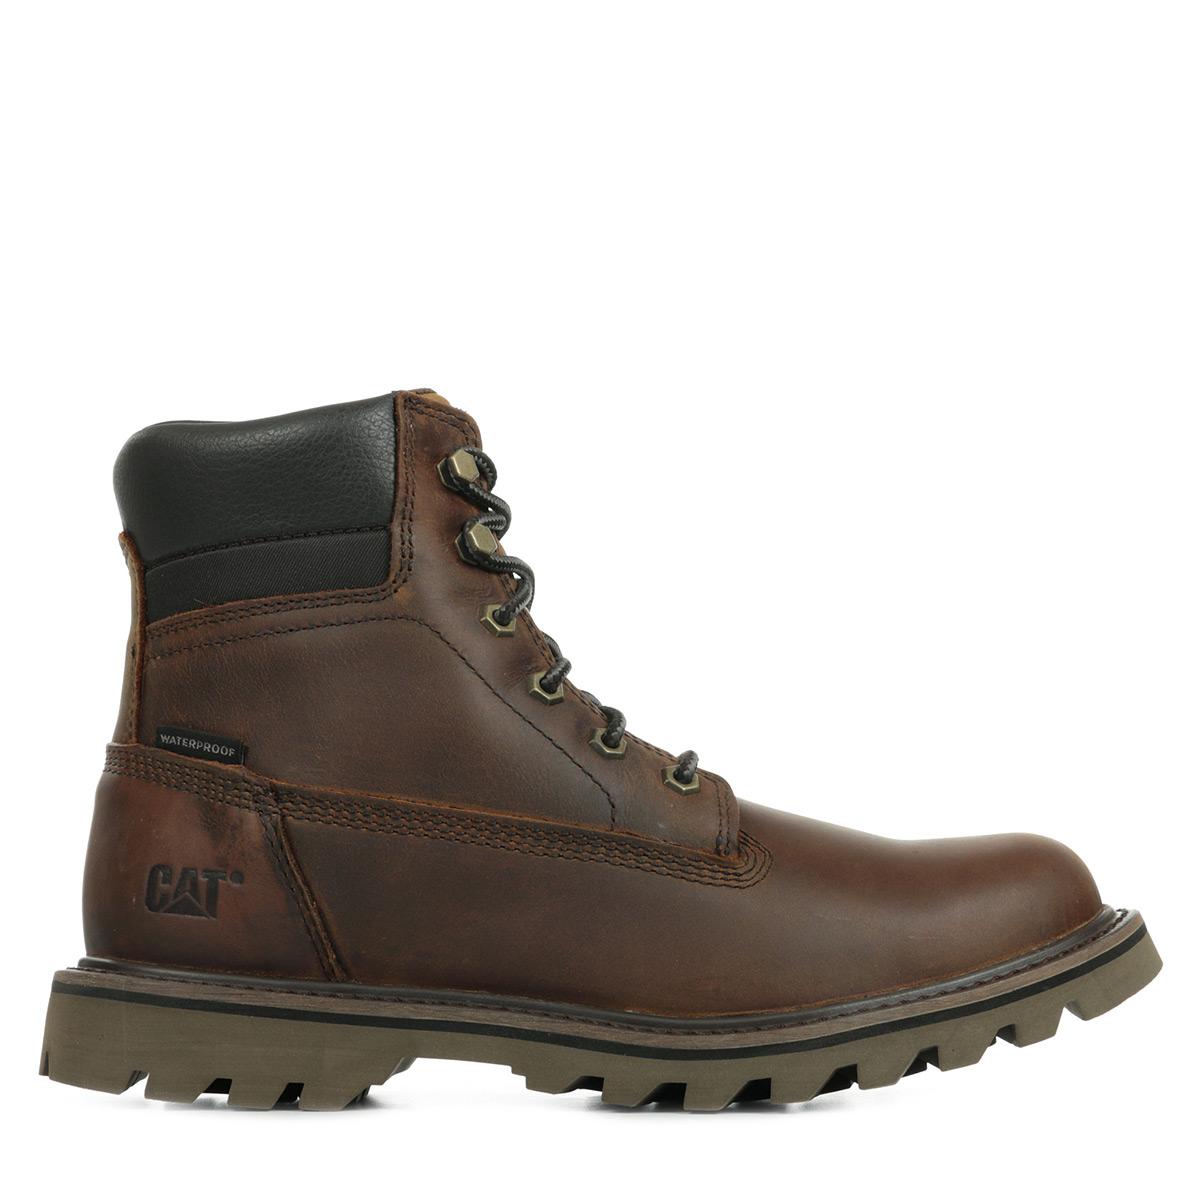 dfe491393402b2 Caterpillar Deplete Wp P721722, Boots homme